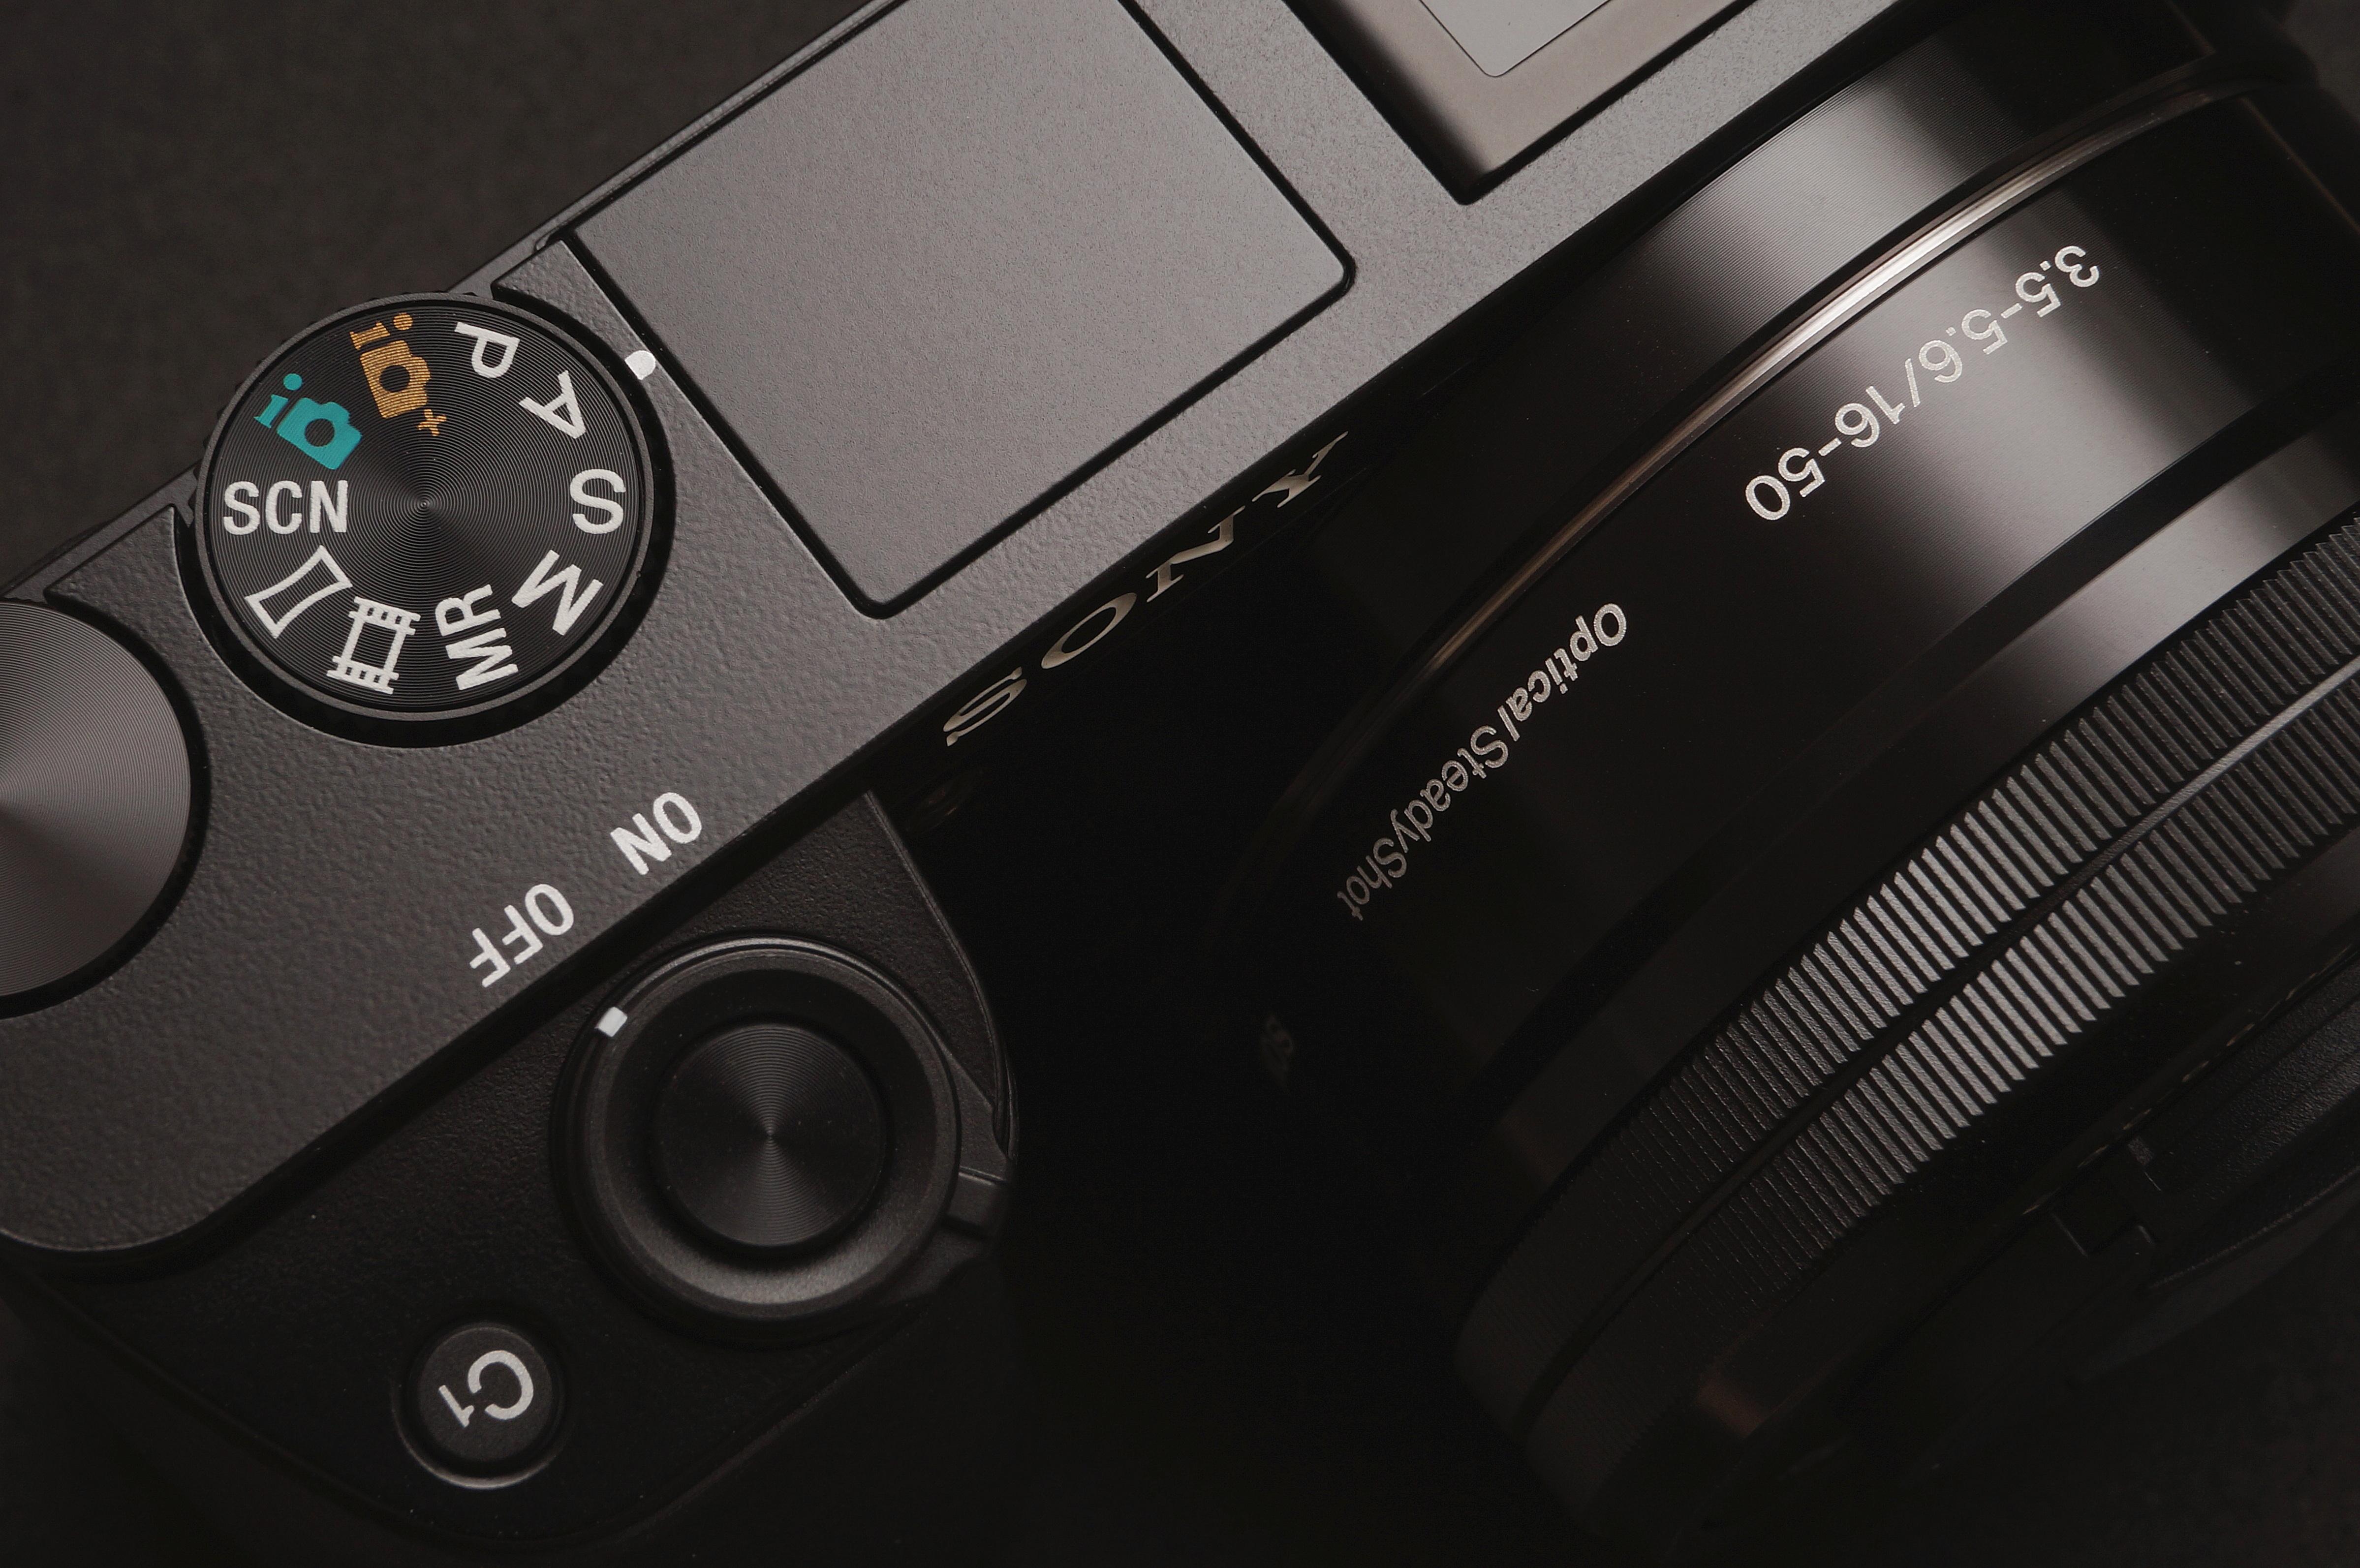 Sony, Profession, Professional, Passion, Camera, HQ Photo